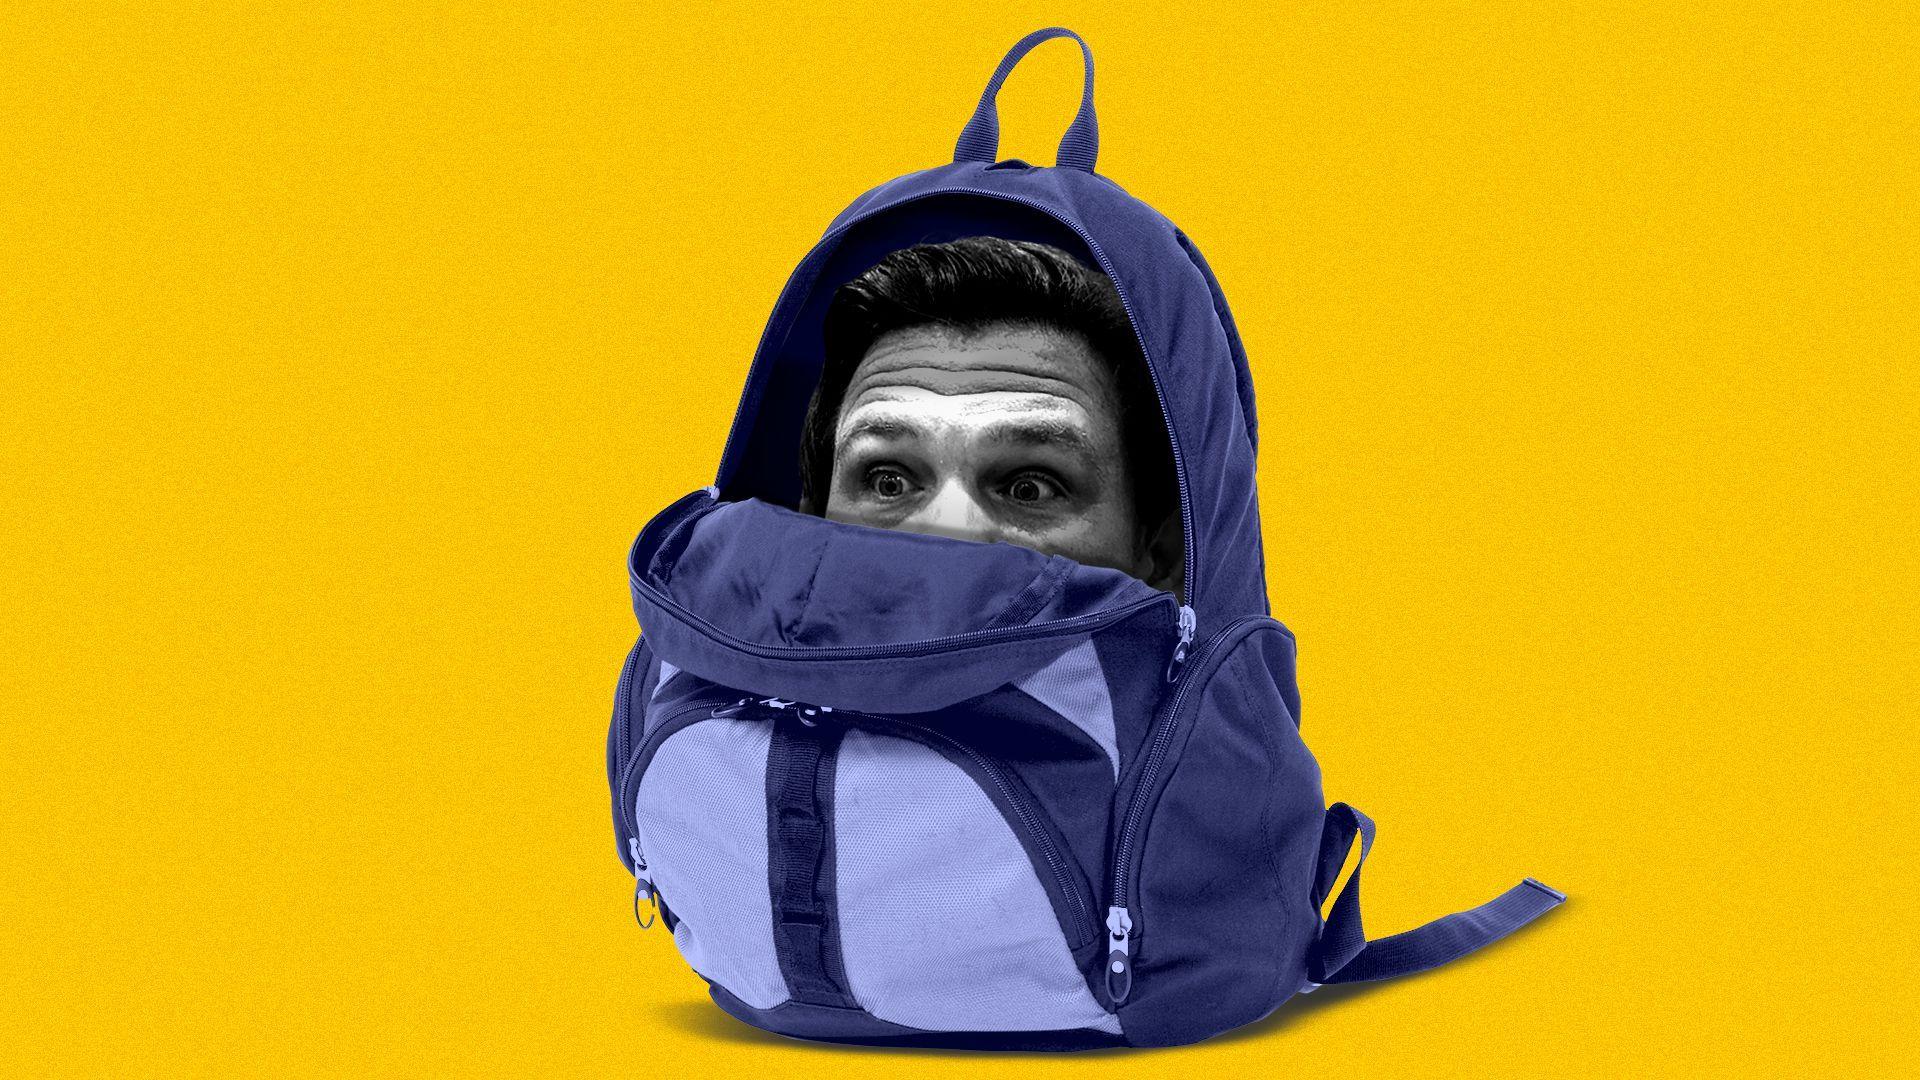 Photo illustration of Florida Gov. Ron DeSantis inside a backpack, peeking out.